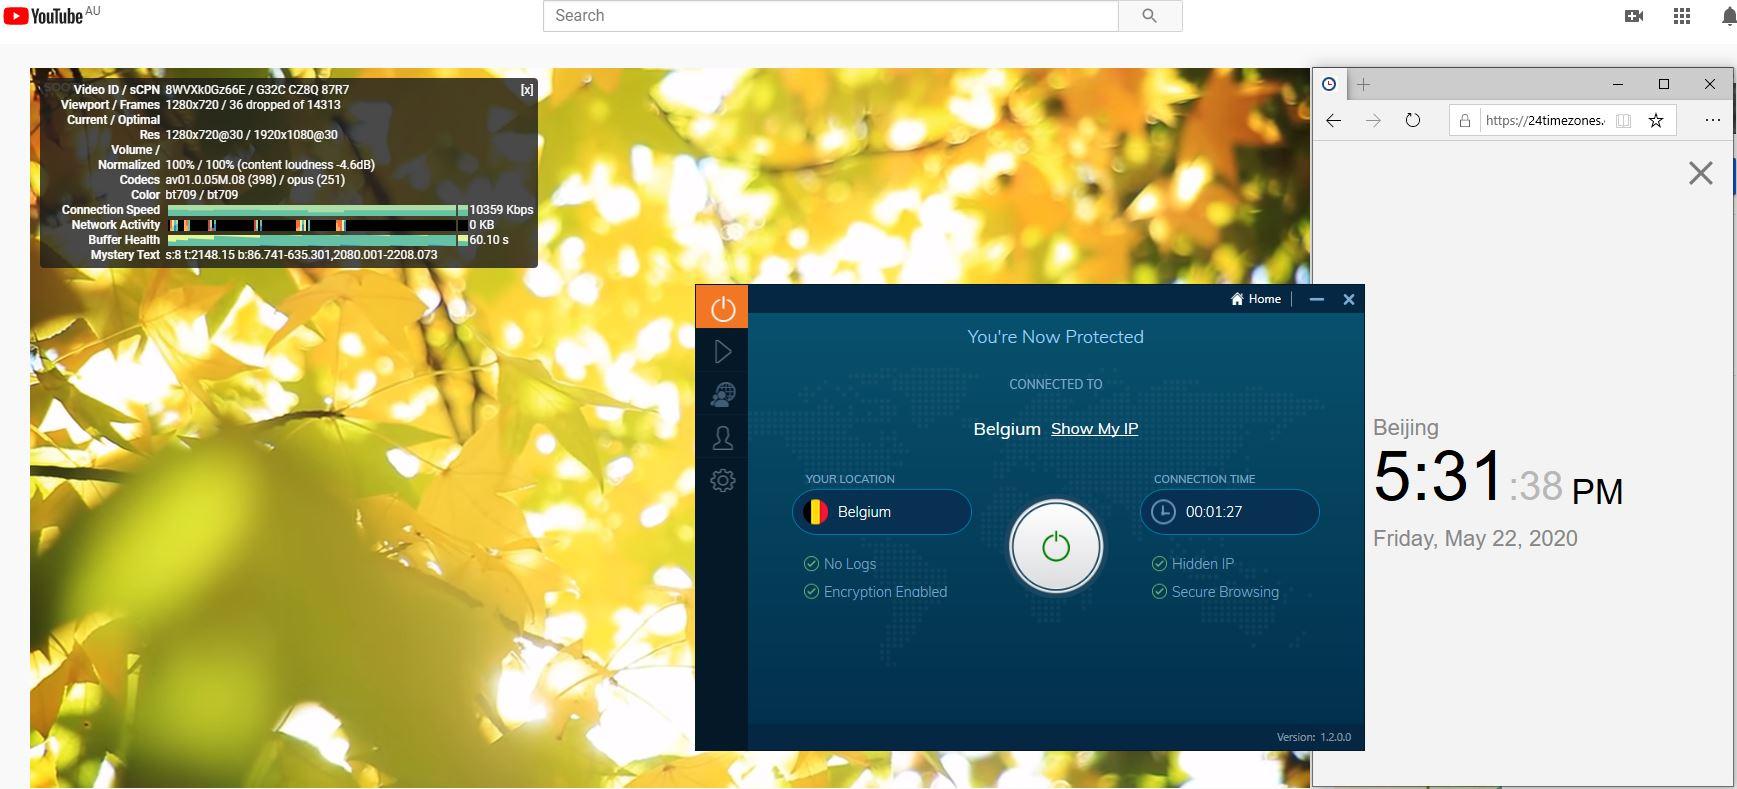 Windows10 IvacyVPN Belgium 中国VPN 翻墙 科学上网 youtube测速-20200522